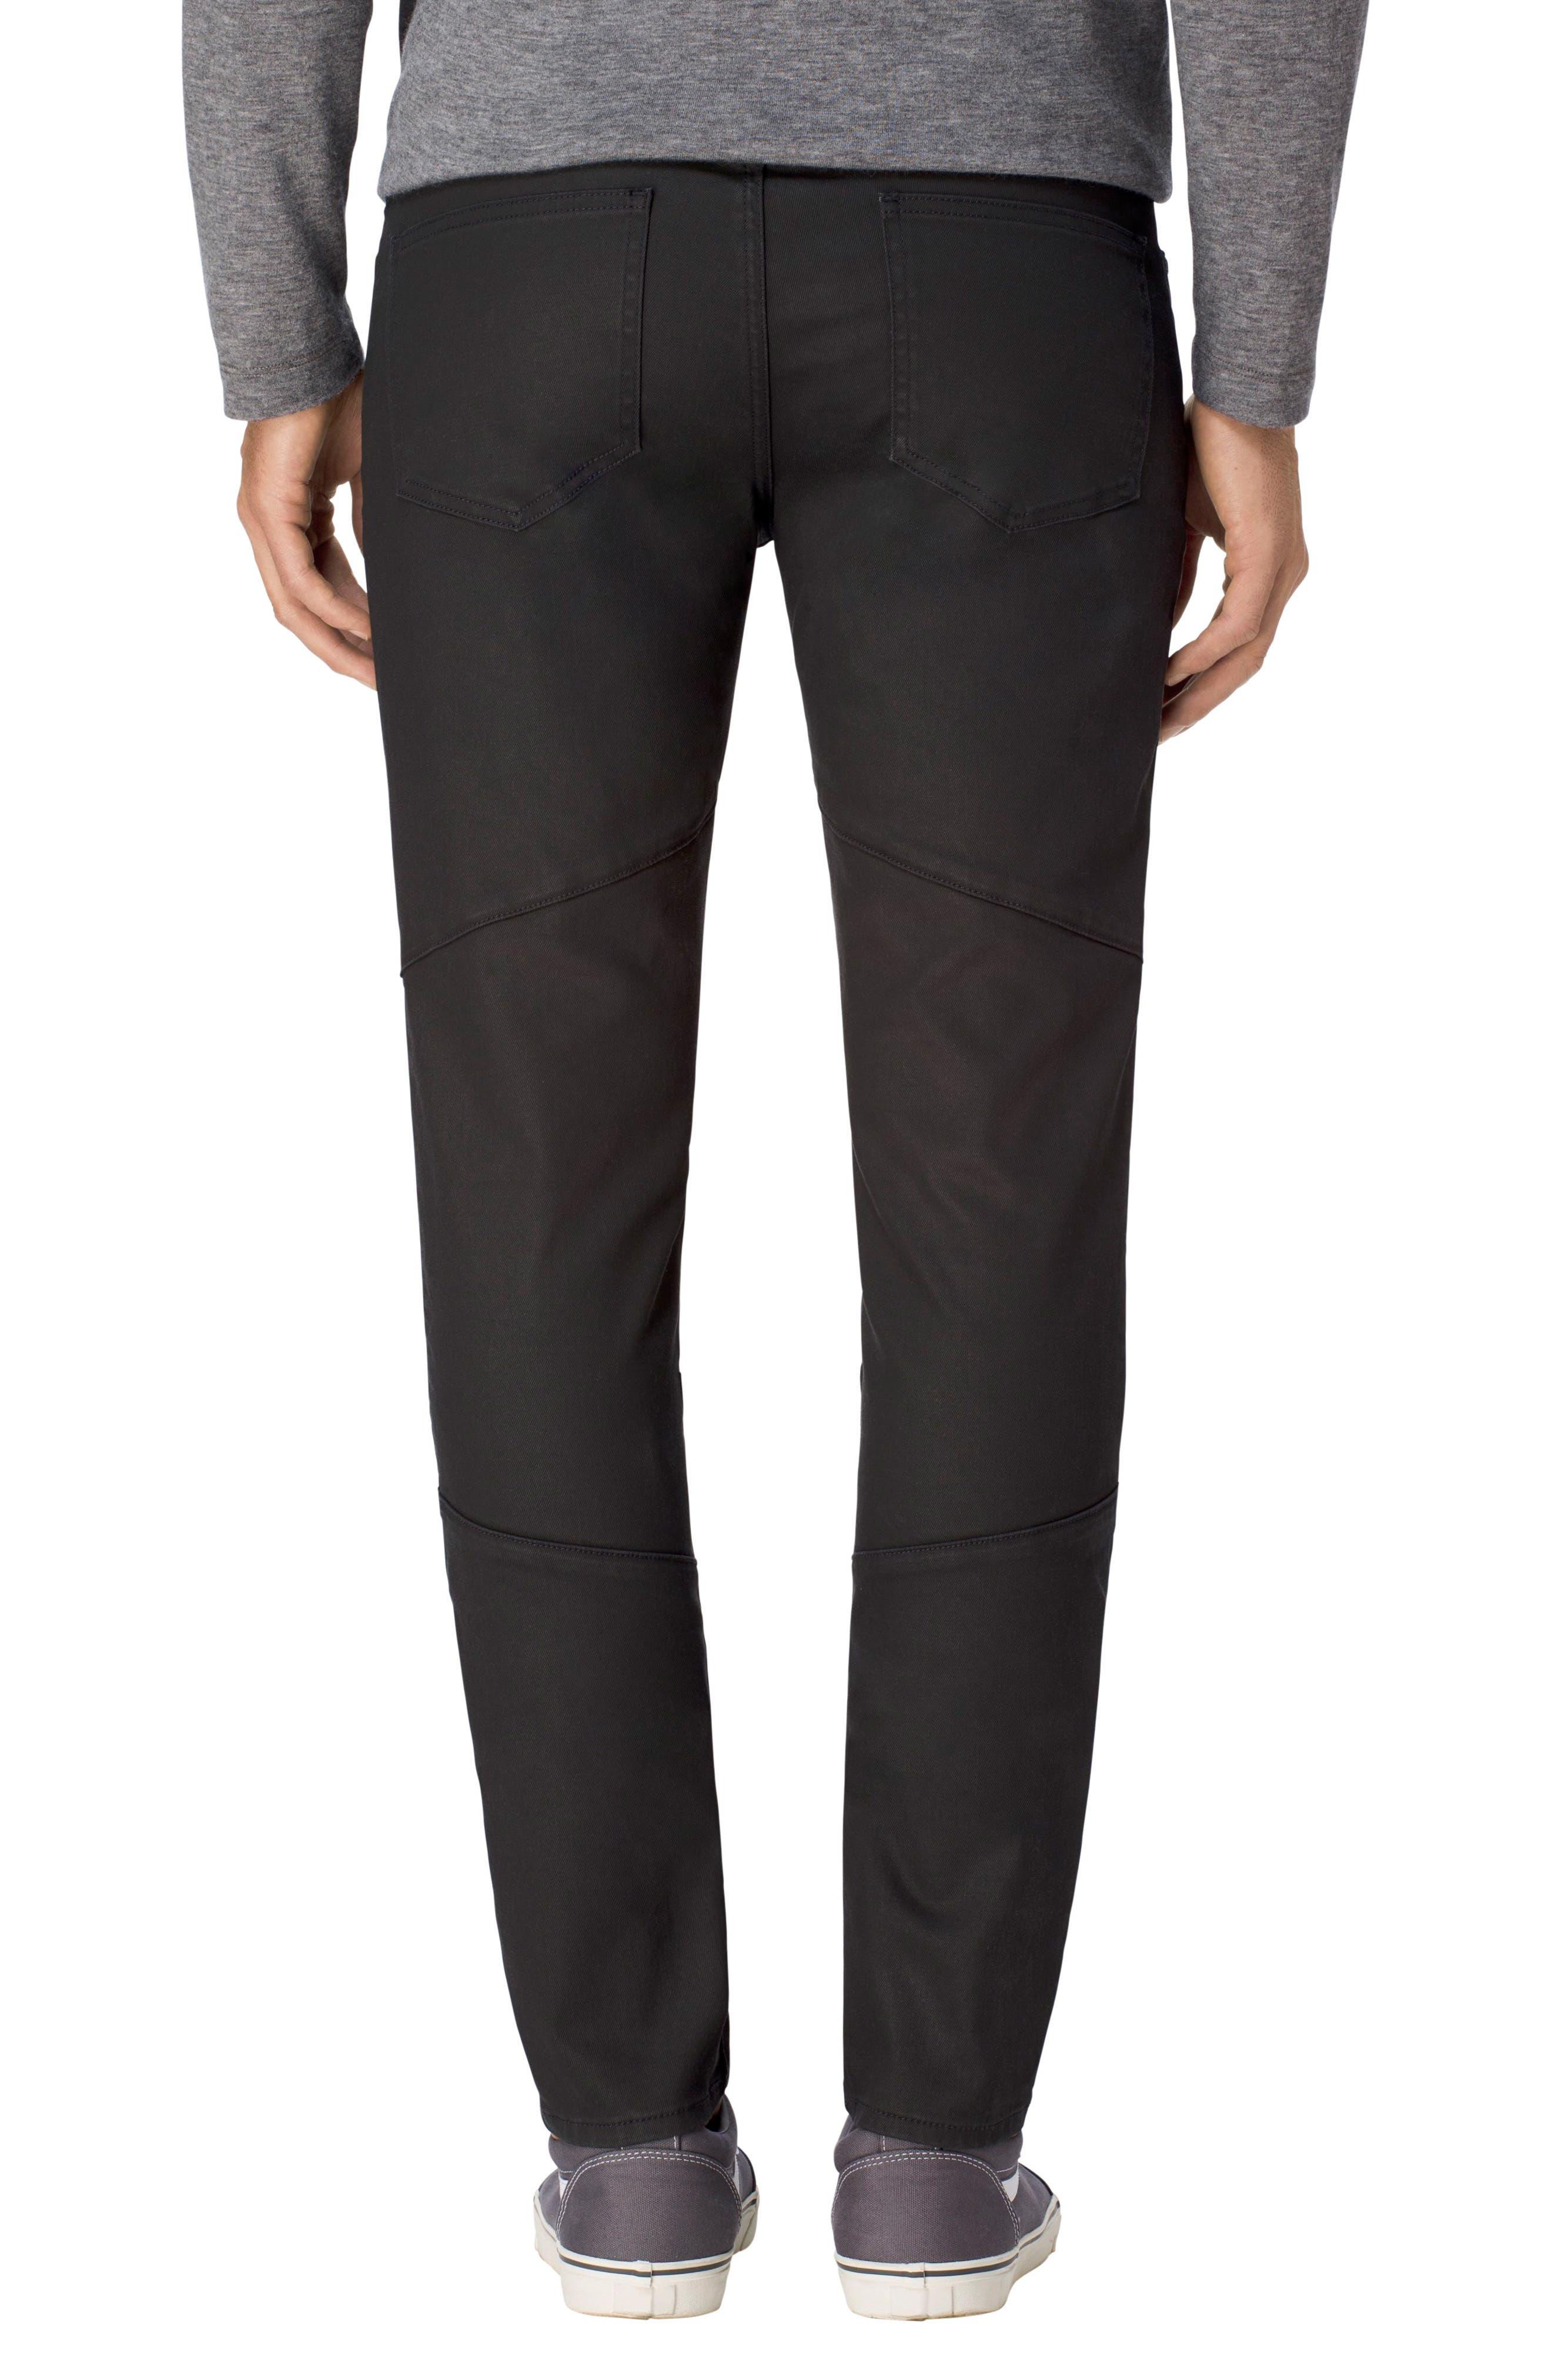 Bearden Moto Skinny Fit Jeans,                             Alternate thumbnail 2, color,